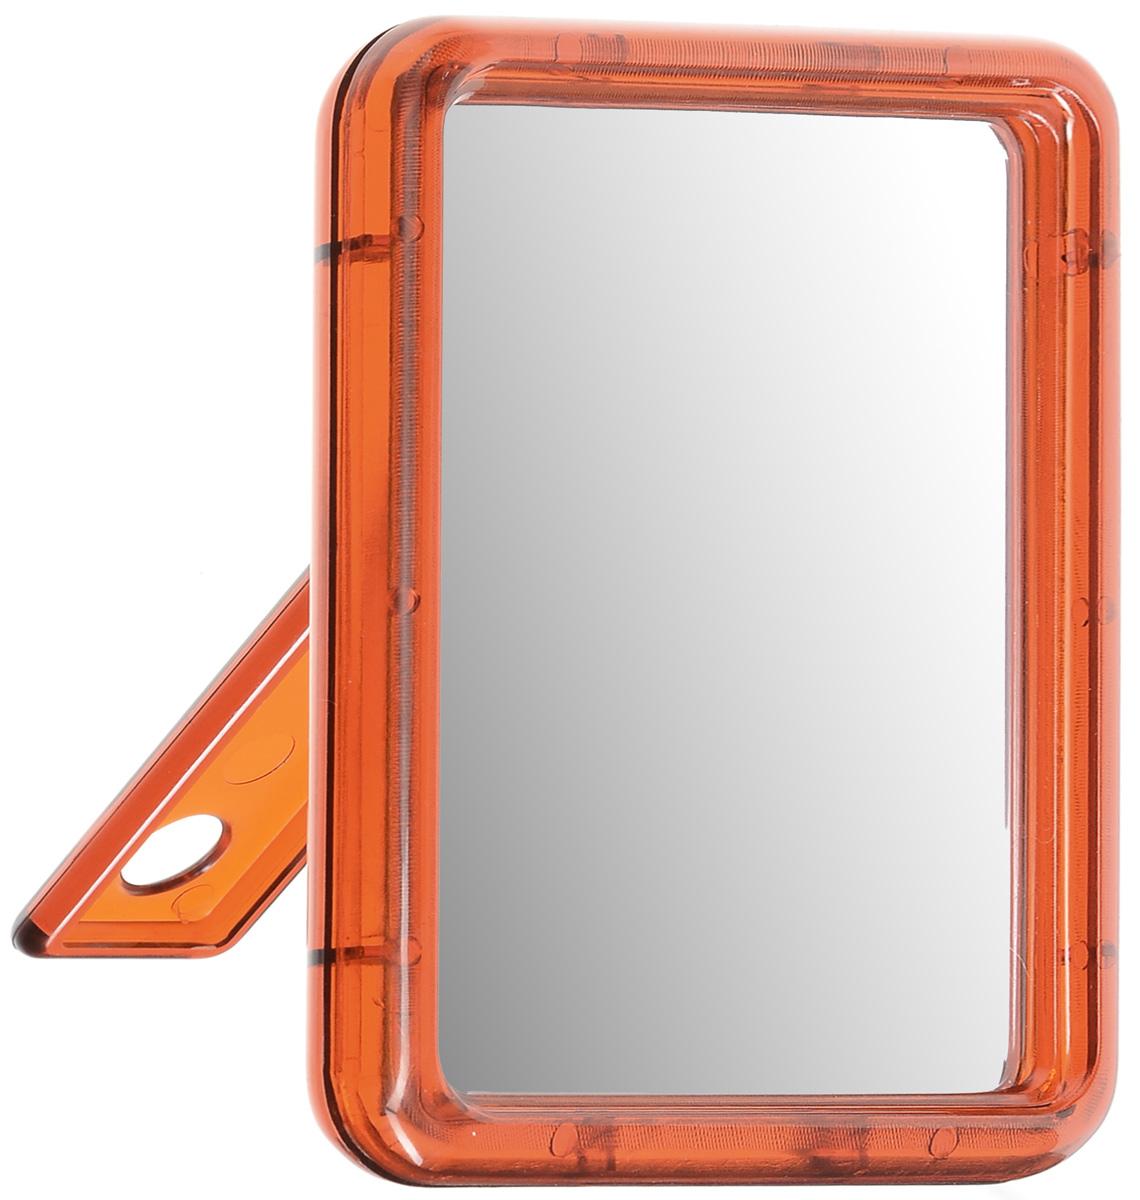 "Зеркало настольное ""Silva"", одностороннее, 10 х 13 см SZ 590"